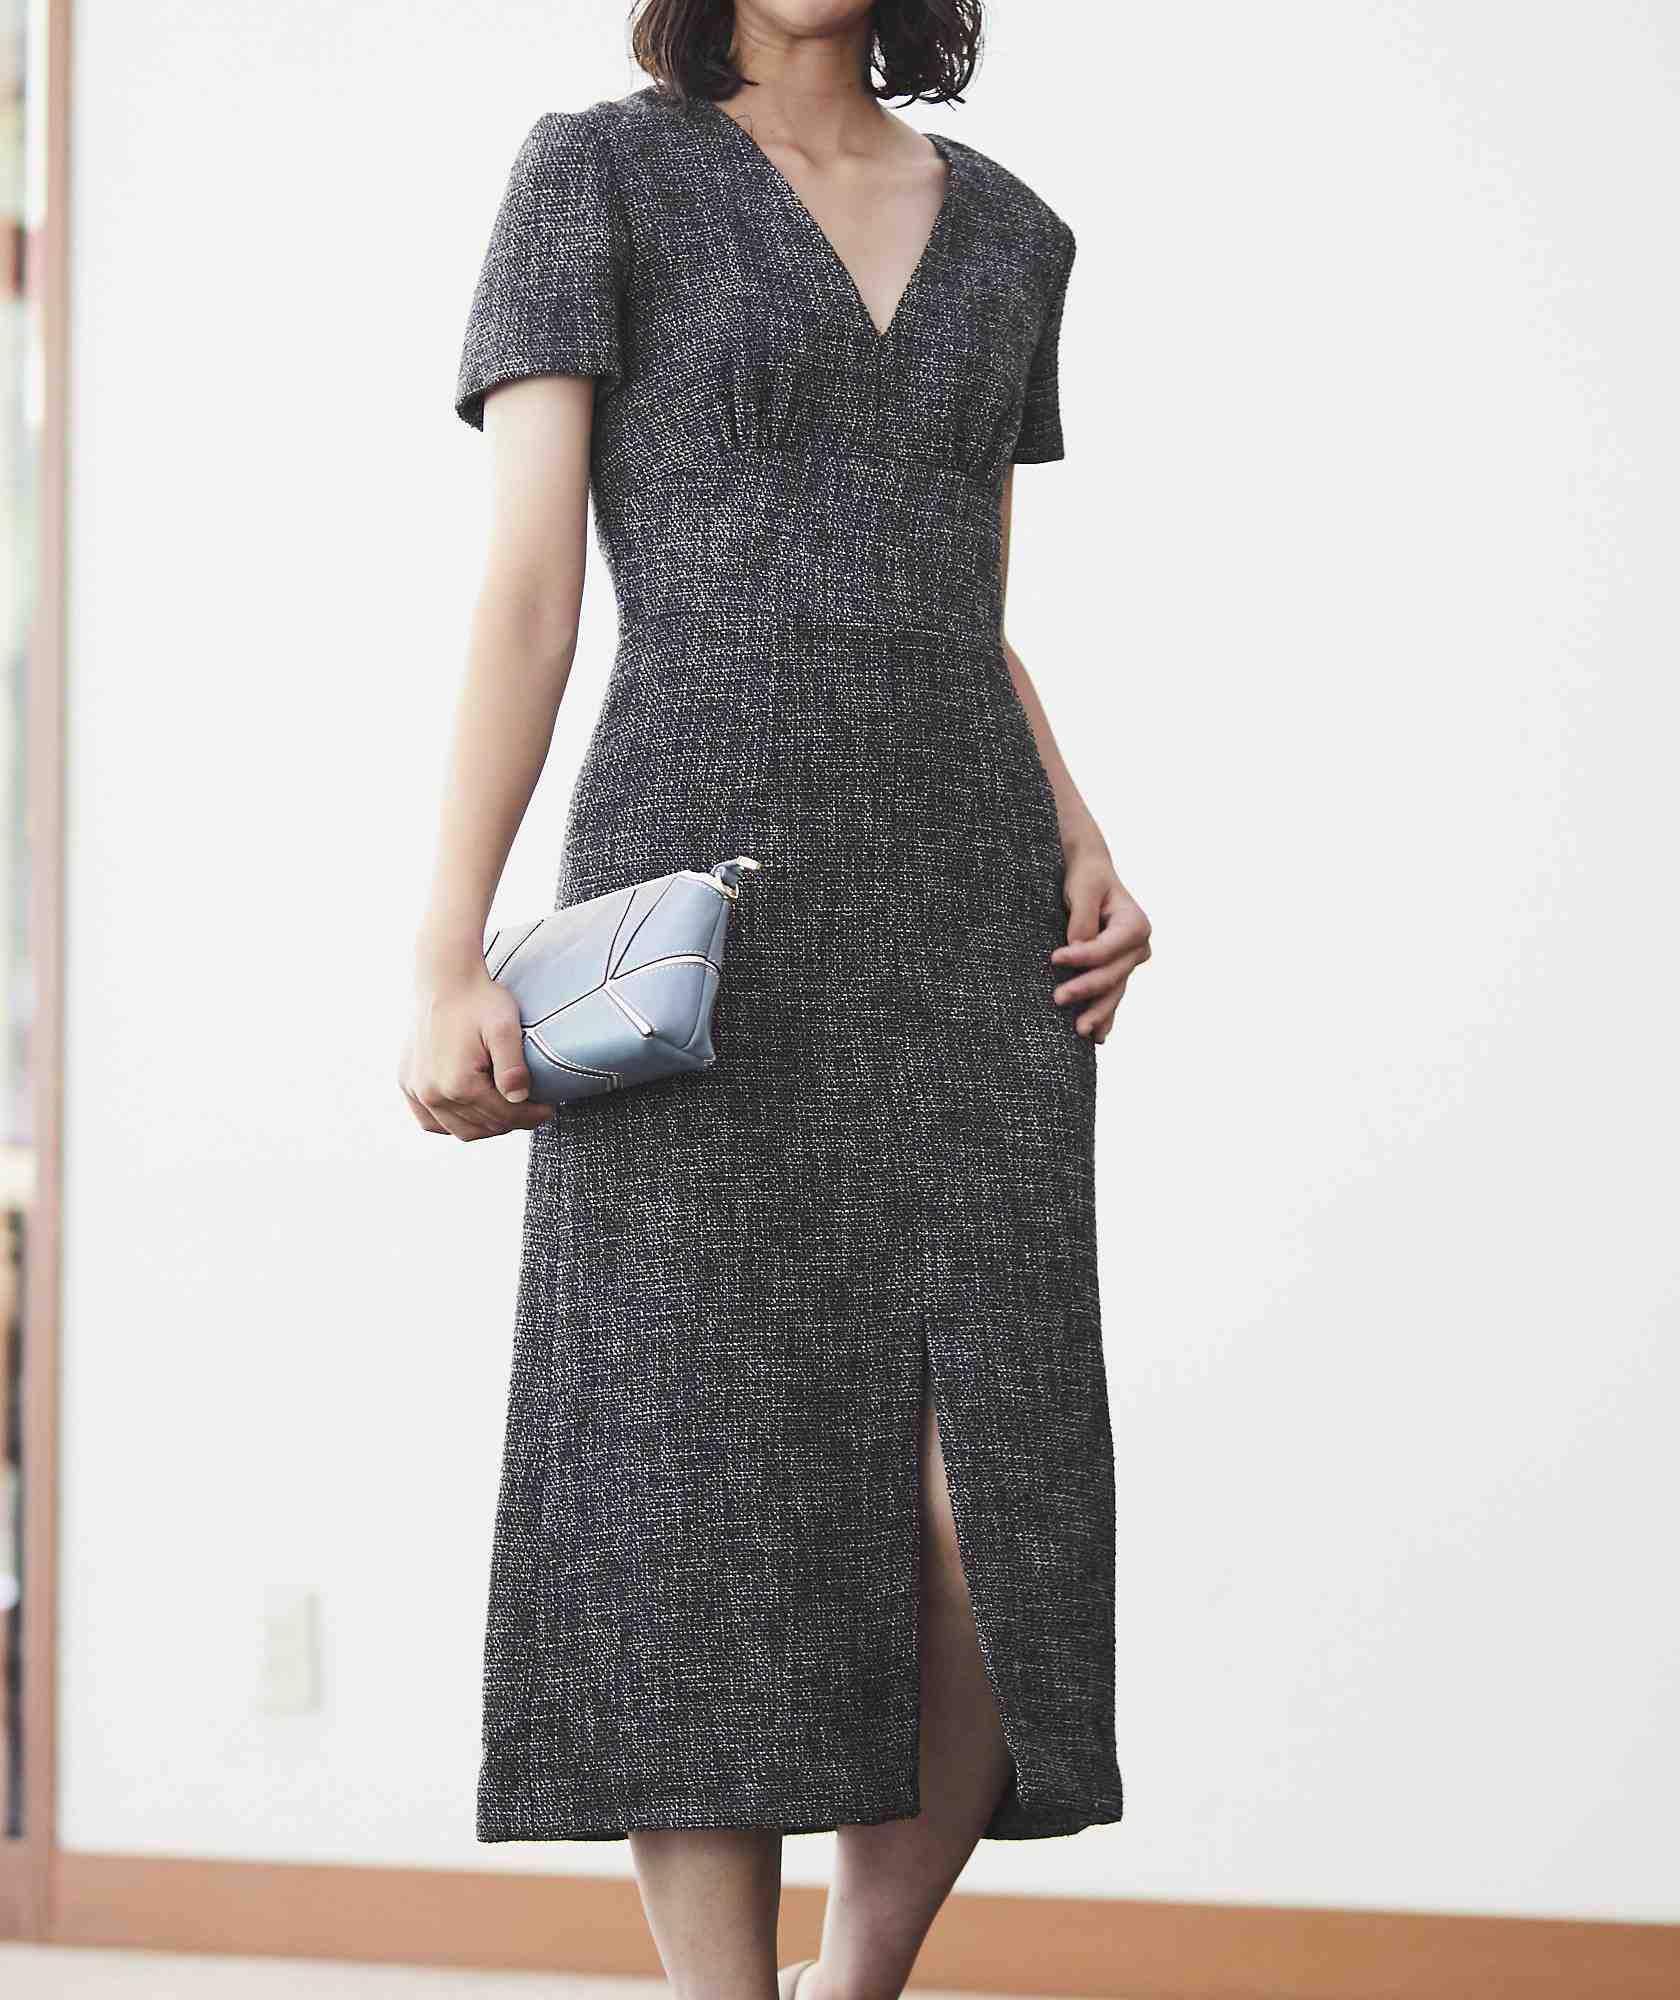 Vネックツイードライクミディアムドレス-ブラック-M